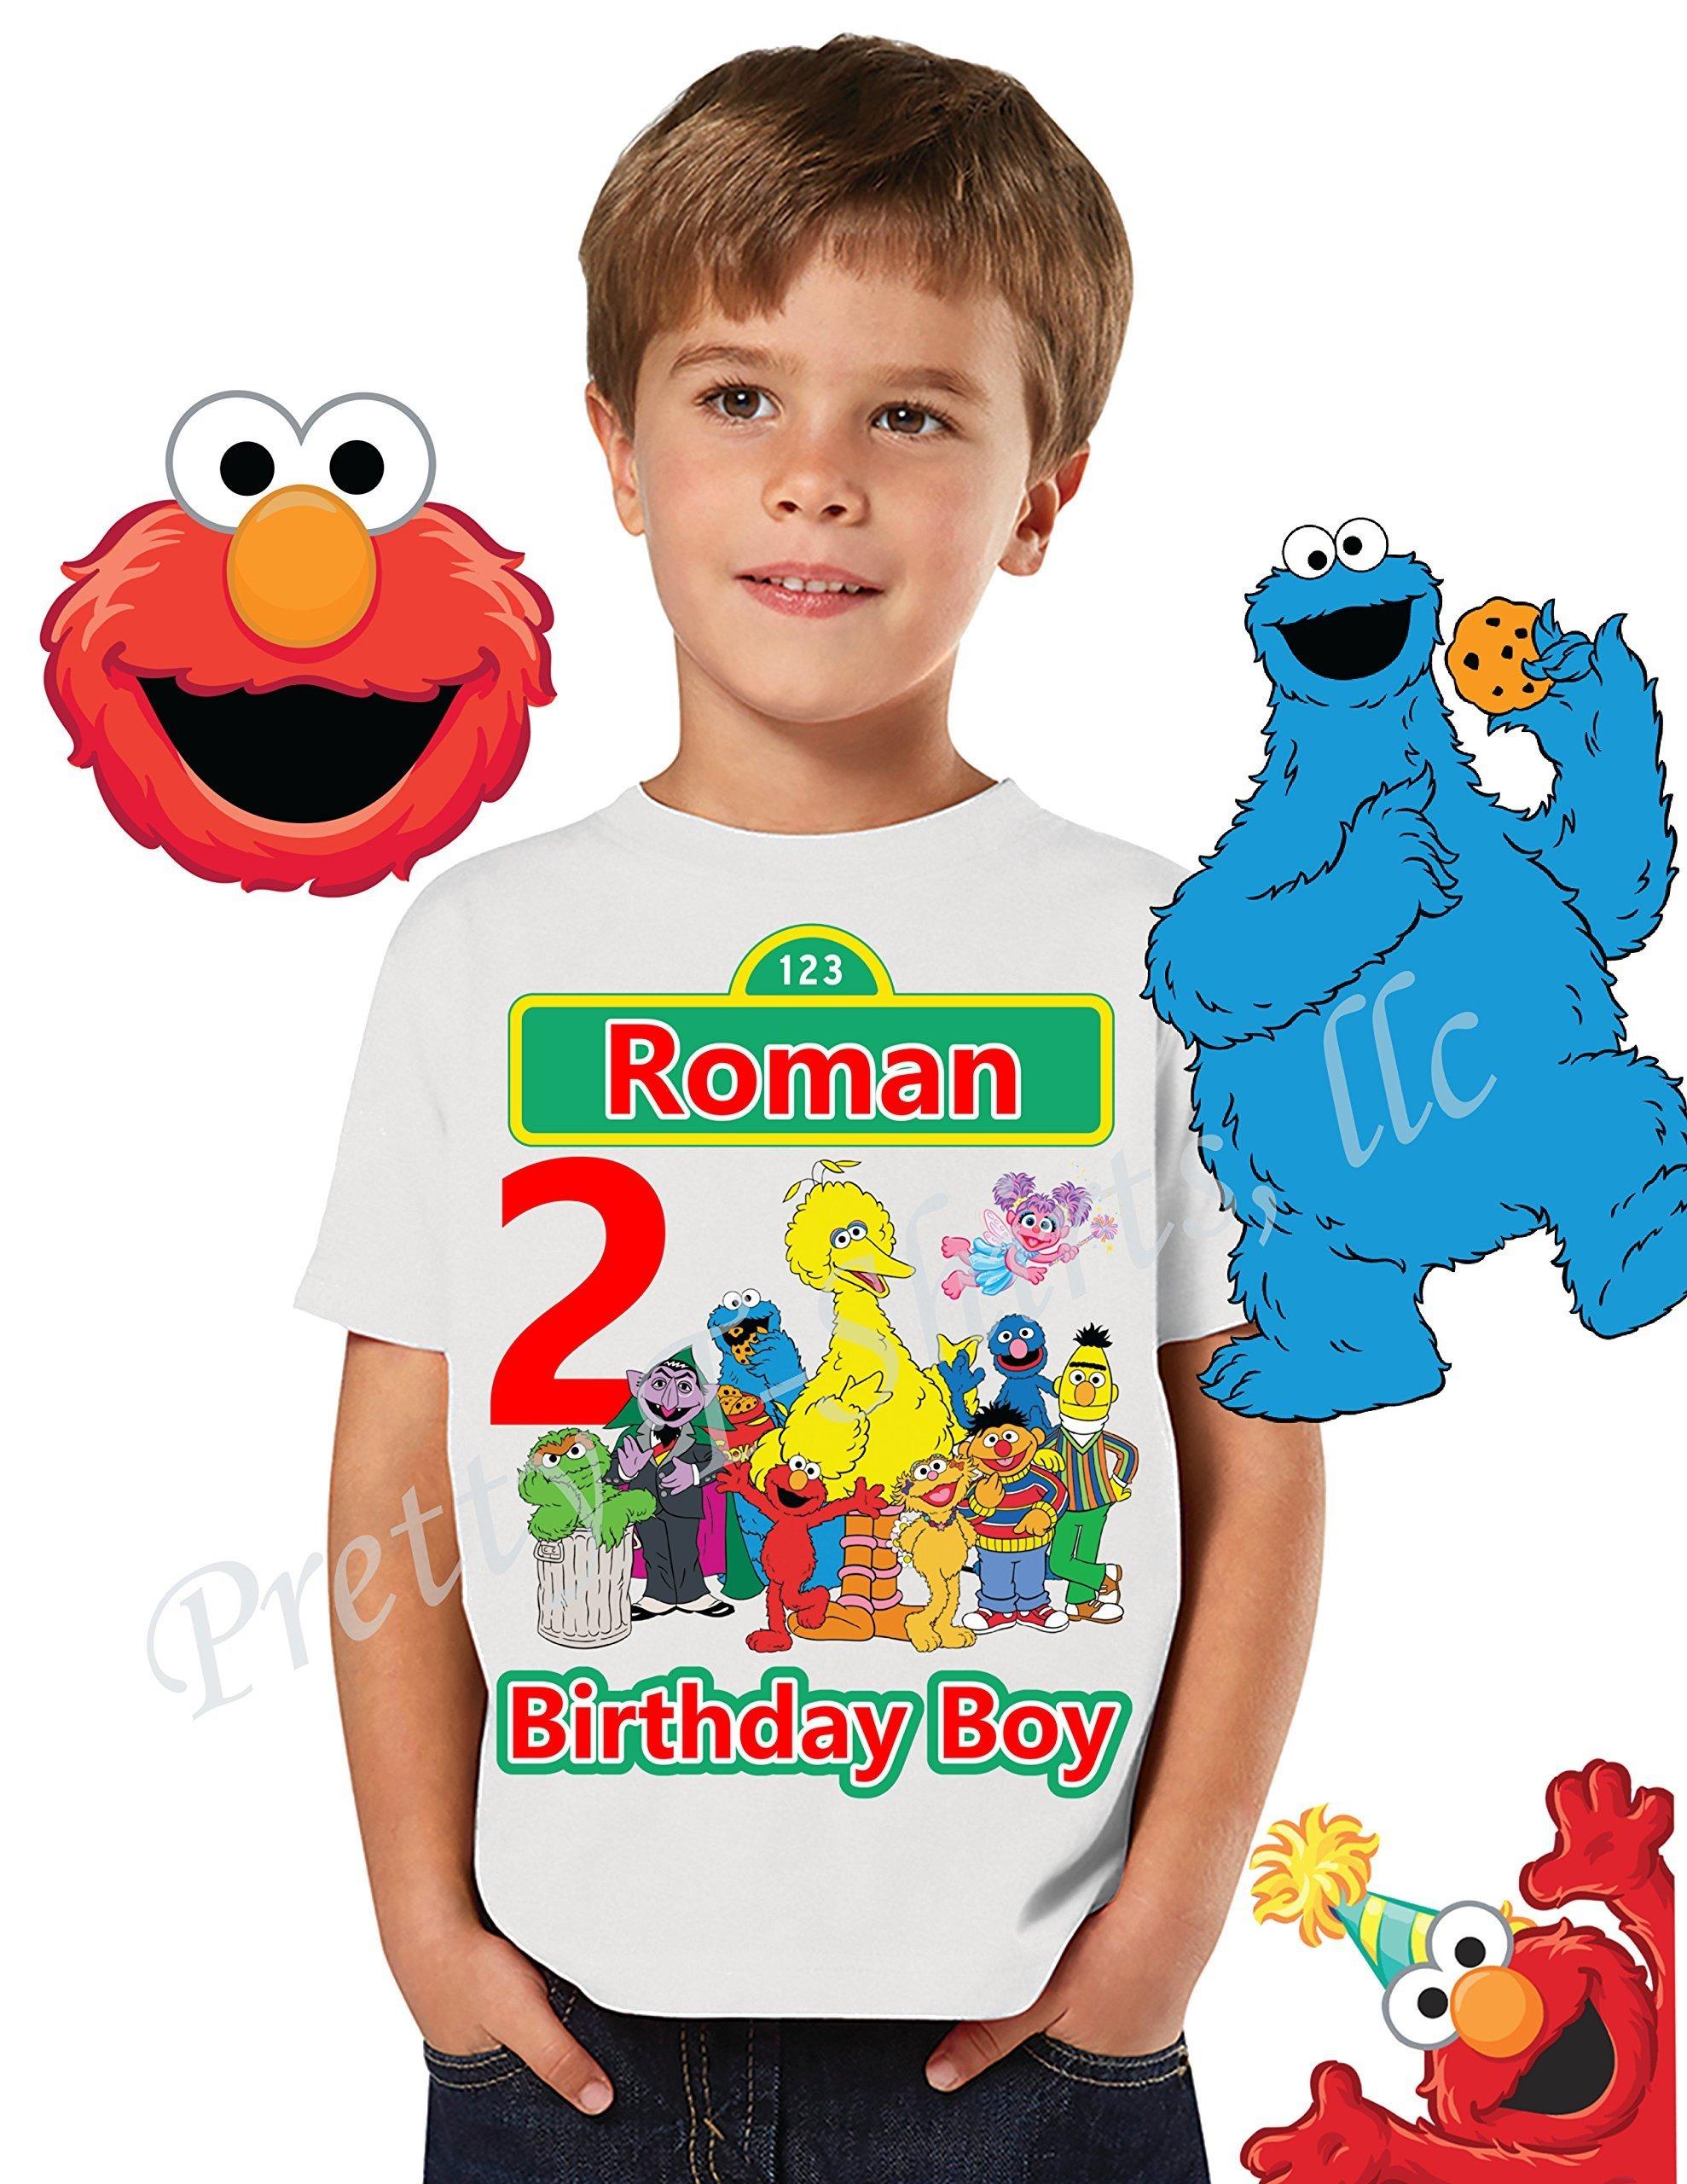 Sesame Street Birthday Shirt, FAMILY Birthday Shirt, Elmo Birthday Boy Shirt, Sesame Street Birthday Party Favor, Boy Birthday Shirt, Cookie Monster, Elmo, Big Bird, Abby, Elmo Shirt, VISIT OUR SHOP!!